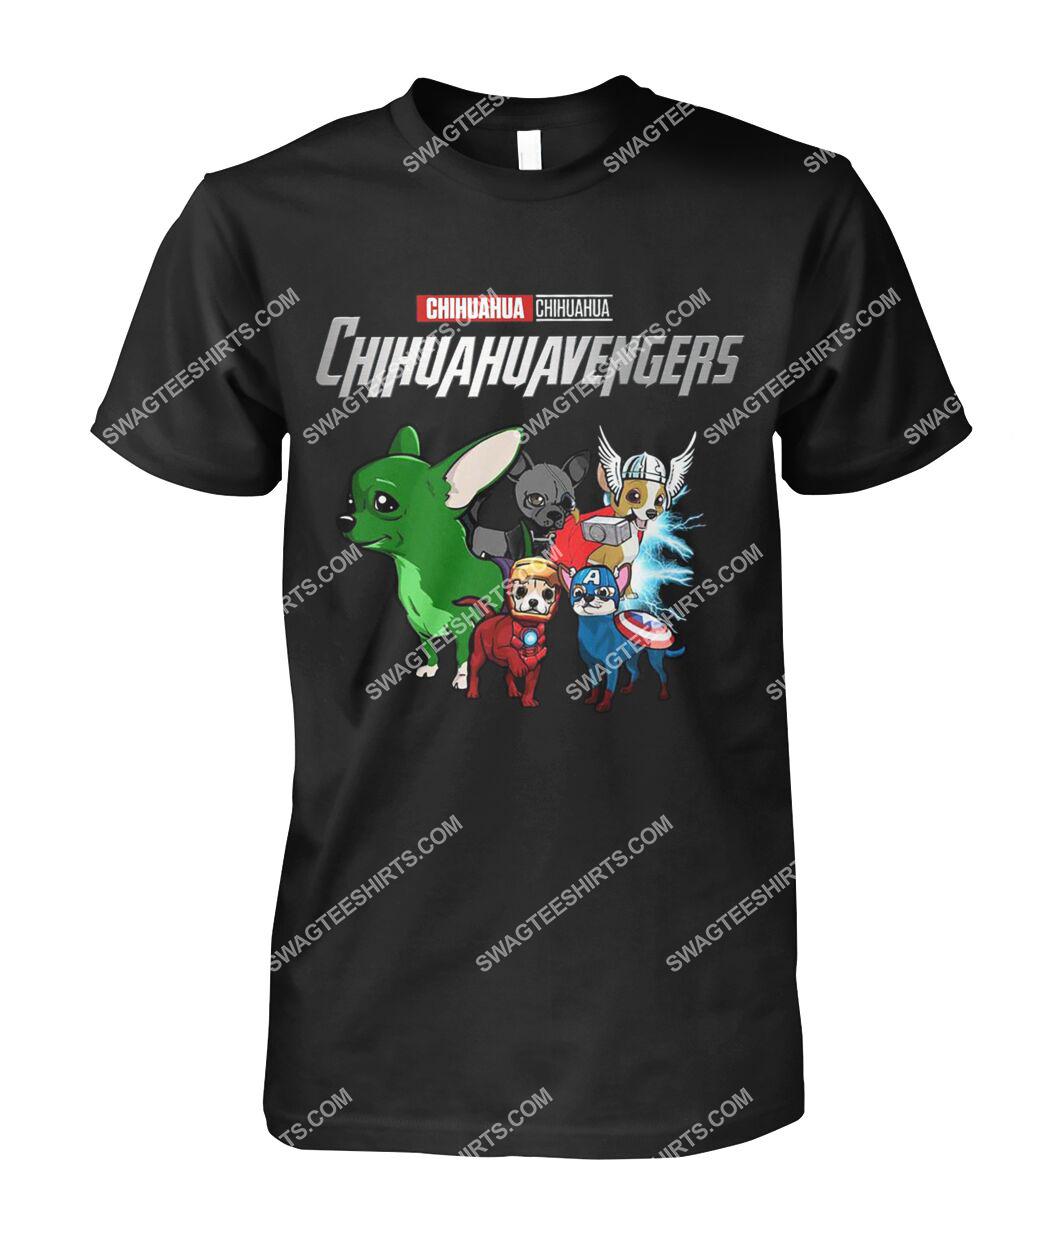 chihuahua chihuahuavengers marvel avengers dogs lover tshirt 1